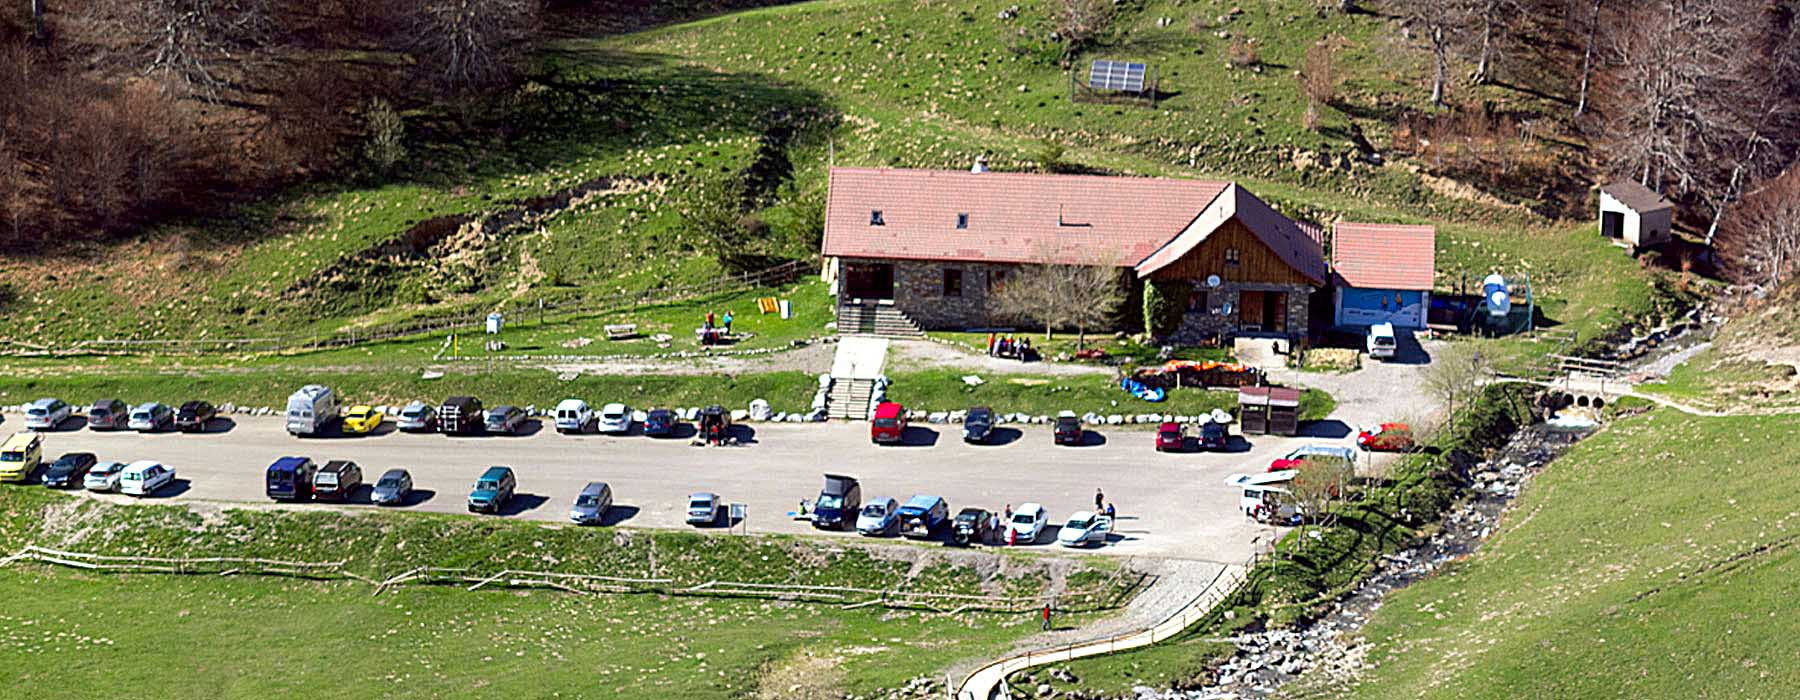 Refugios de montaña a pie de carretera: Linza.